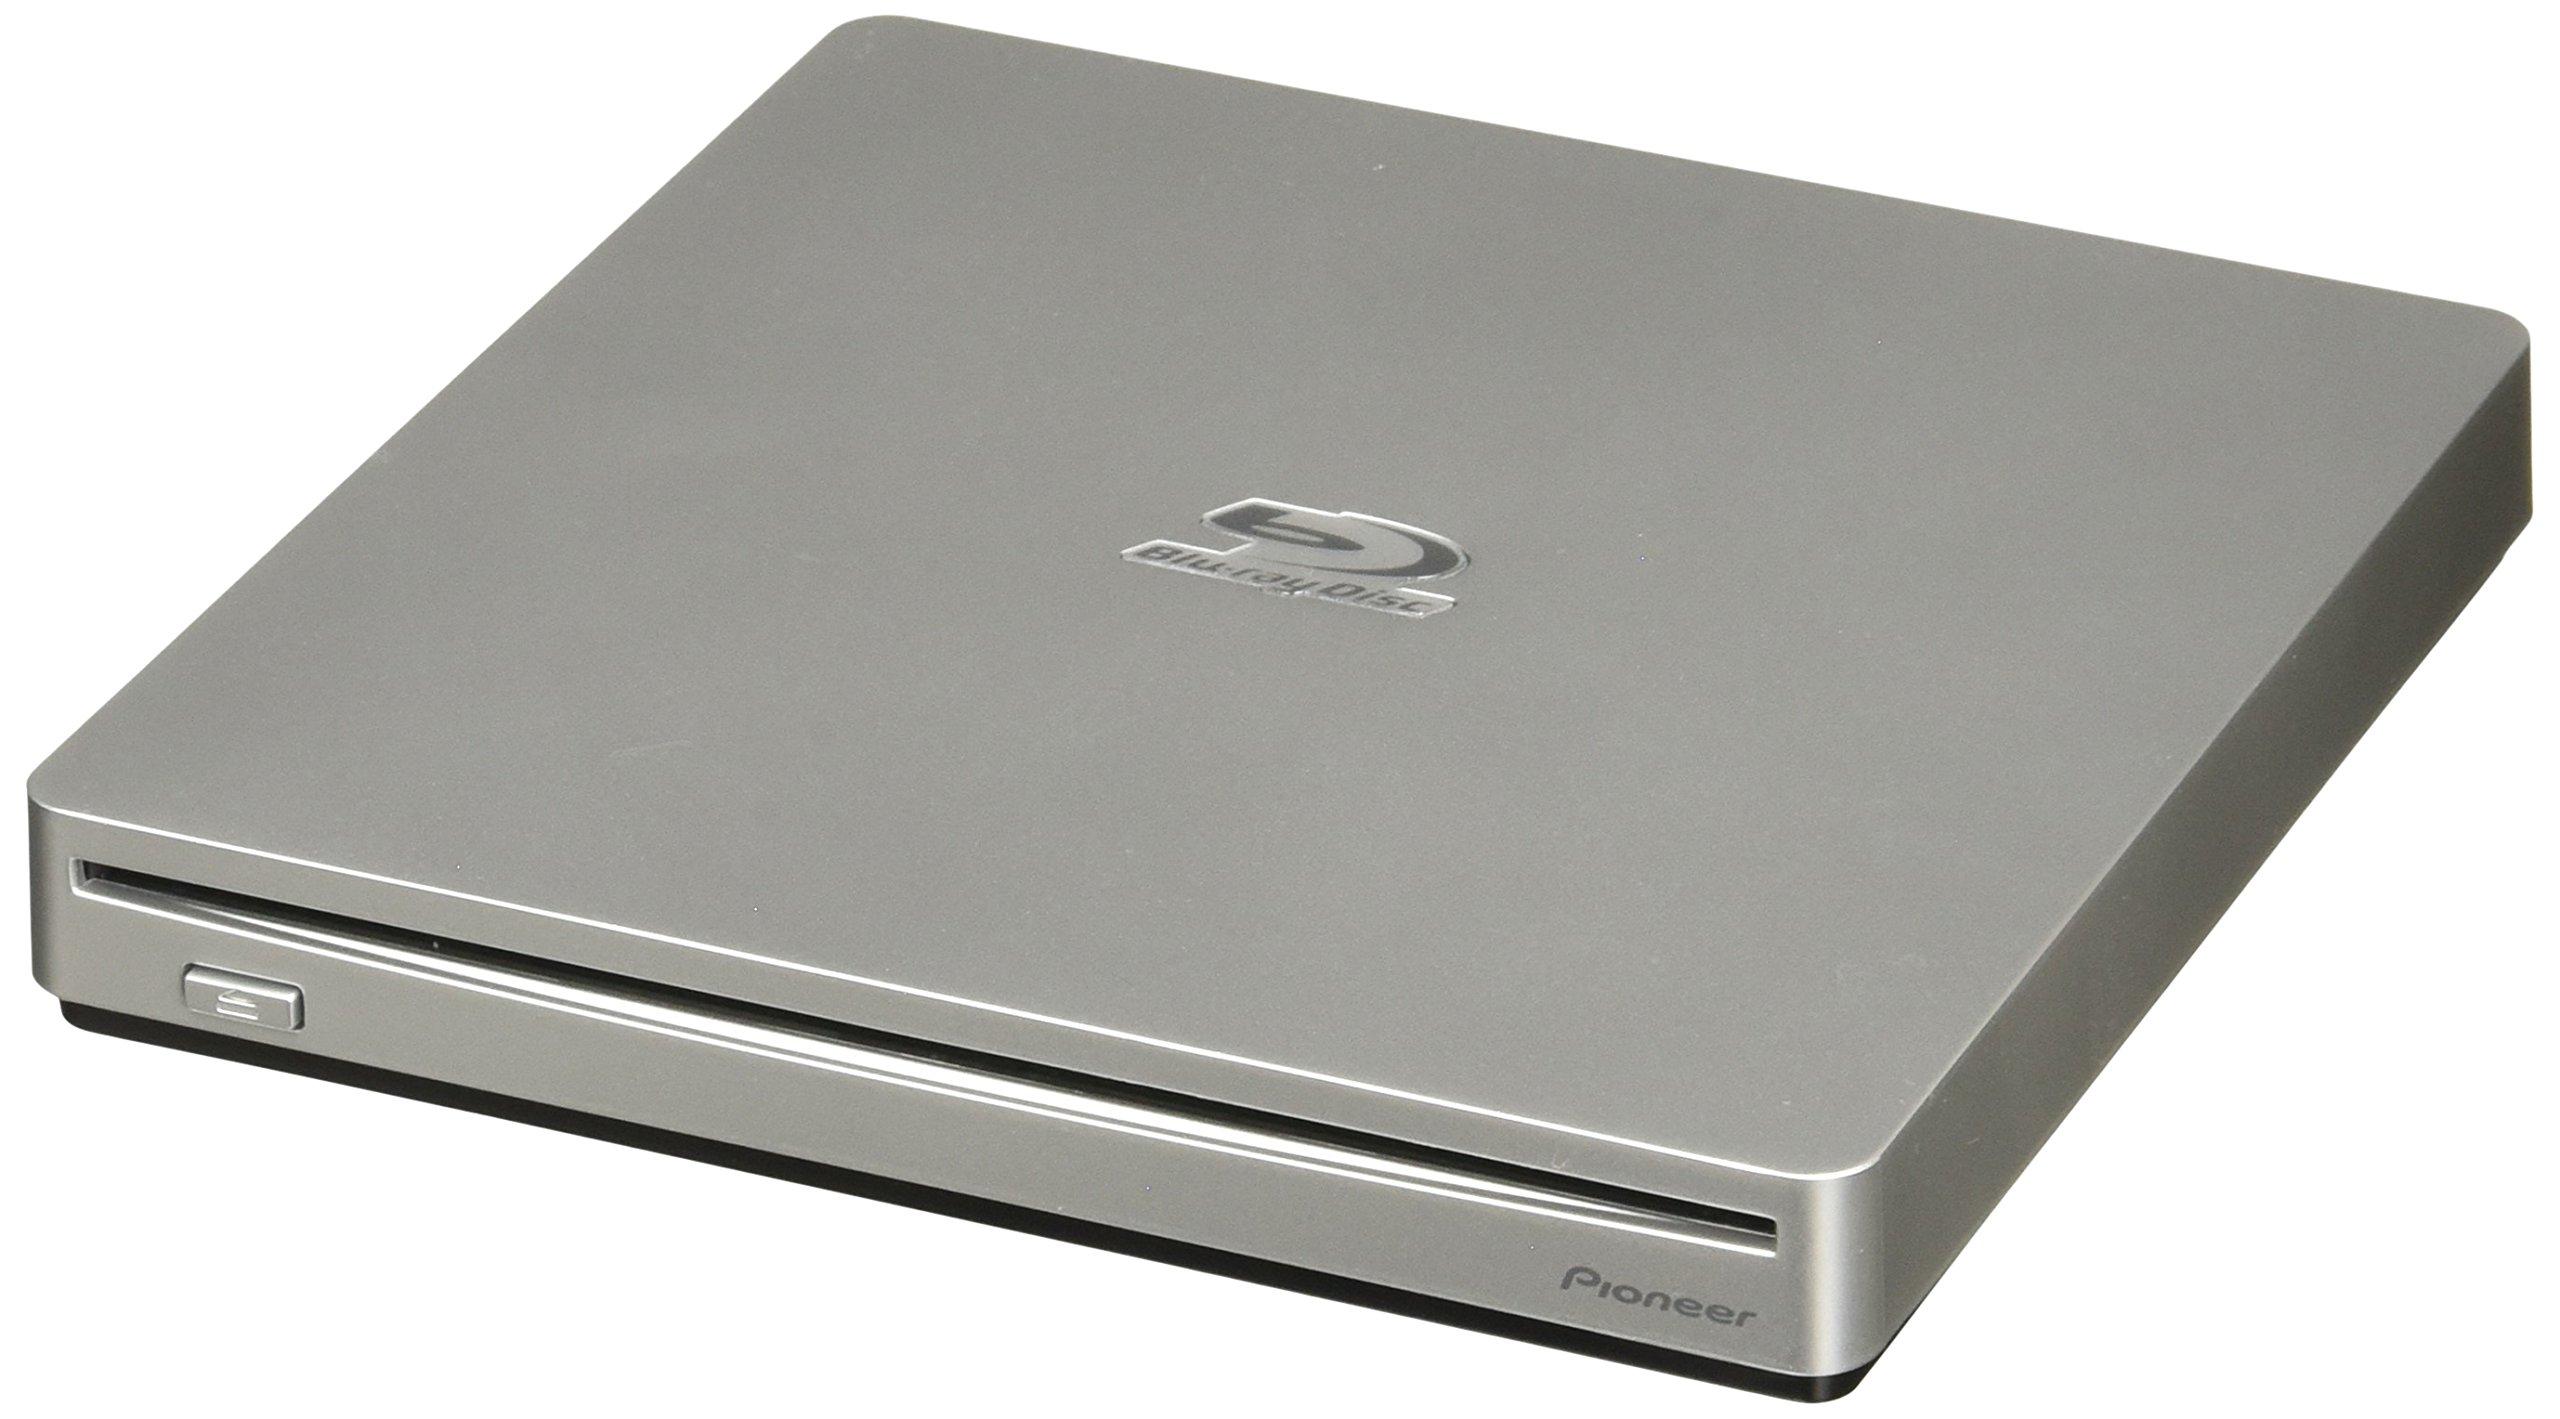 Pioneer BDR-XS06 Blu-Ray 6X/DVD/CD USB 3.0 Slim External Slot Burner by Pioneer